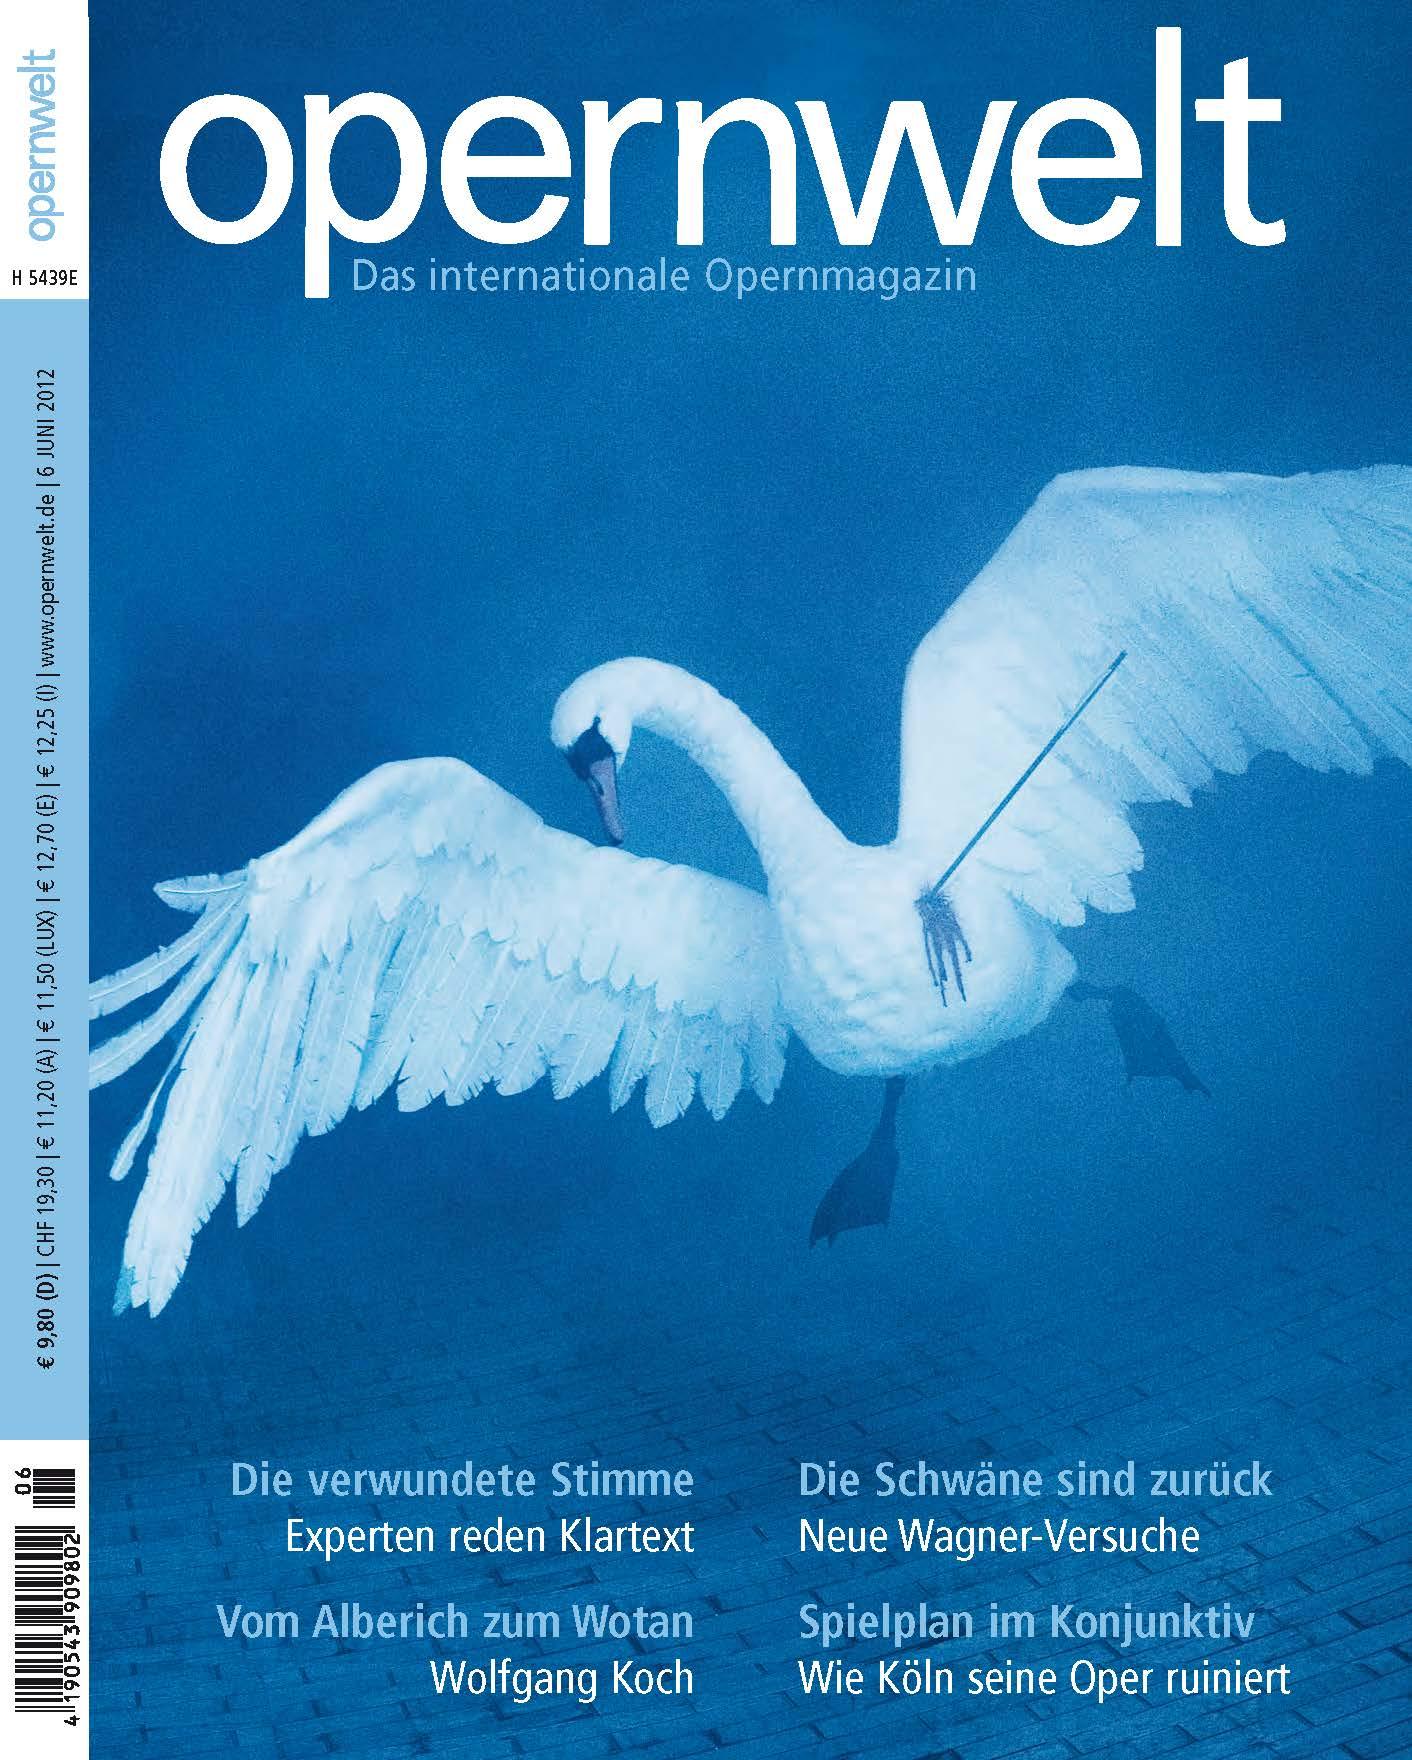 Opernwelt Juni (6/2012)